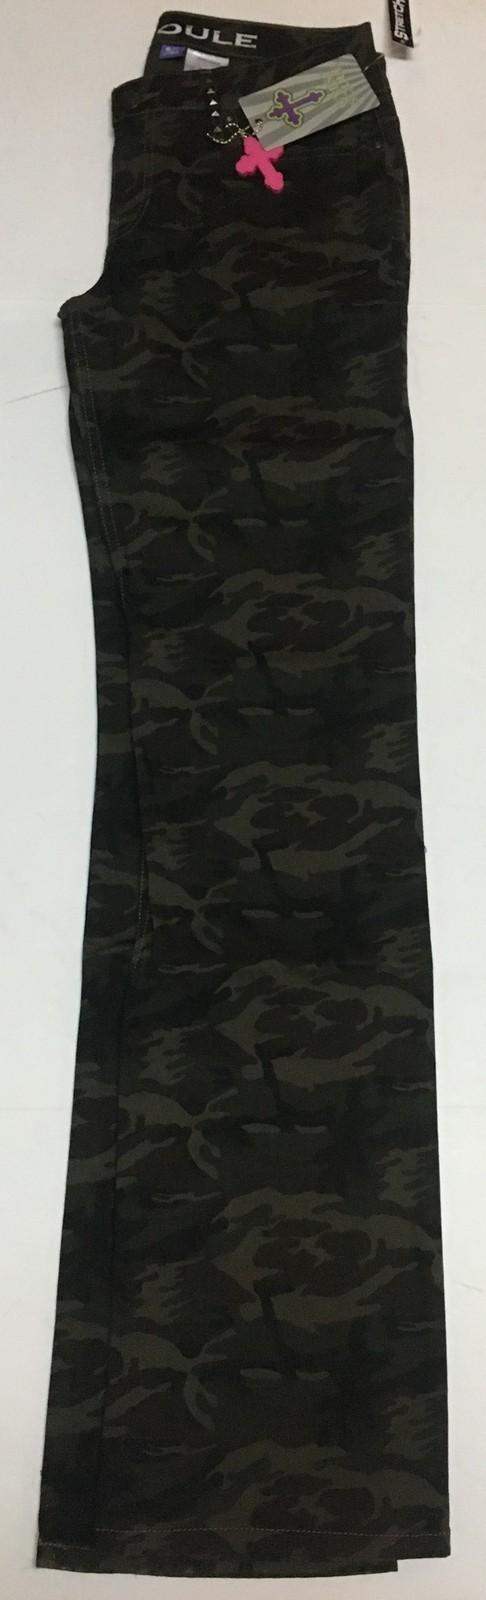 Gypsy Soule Camouflage Pants Jane Sz 6/28 NWT image 3